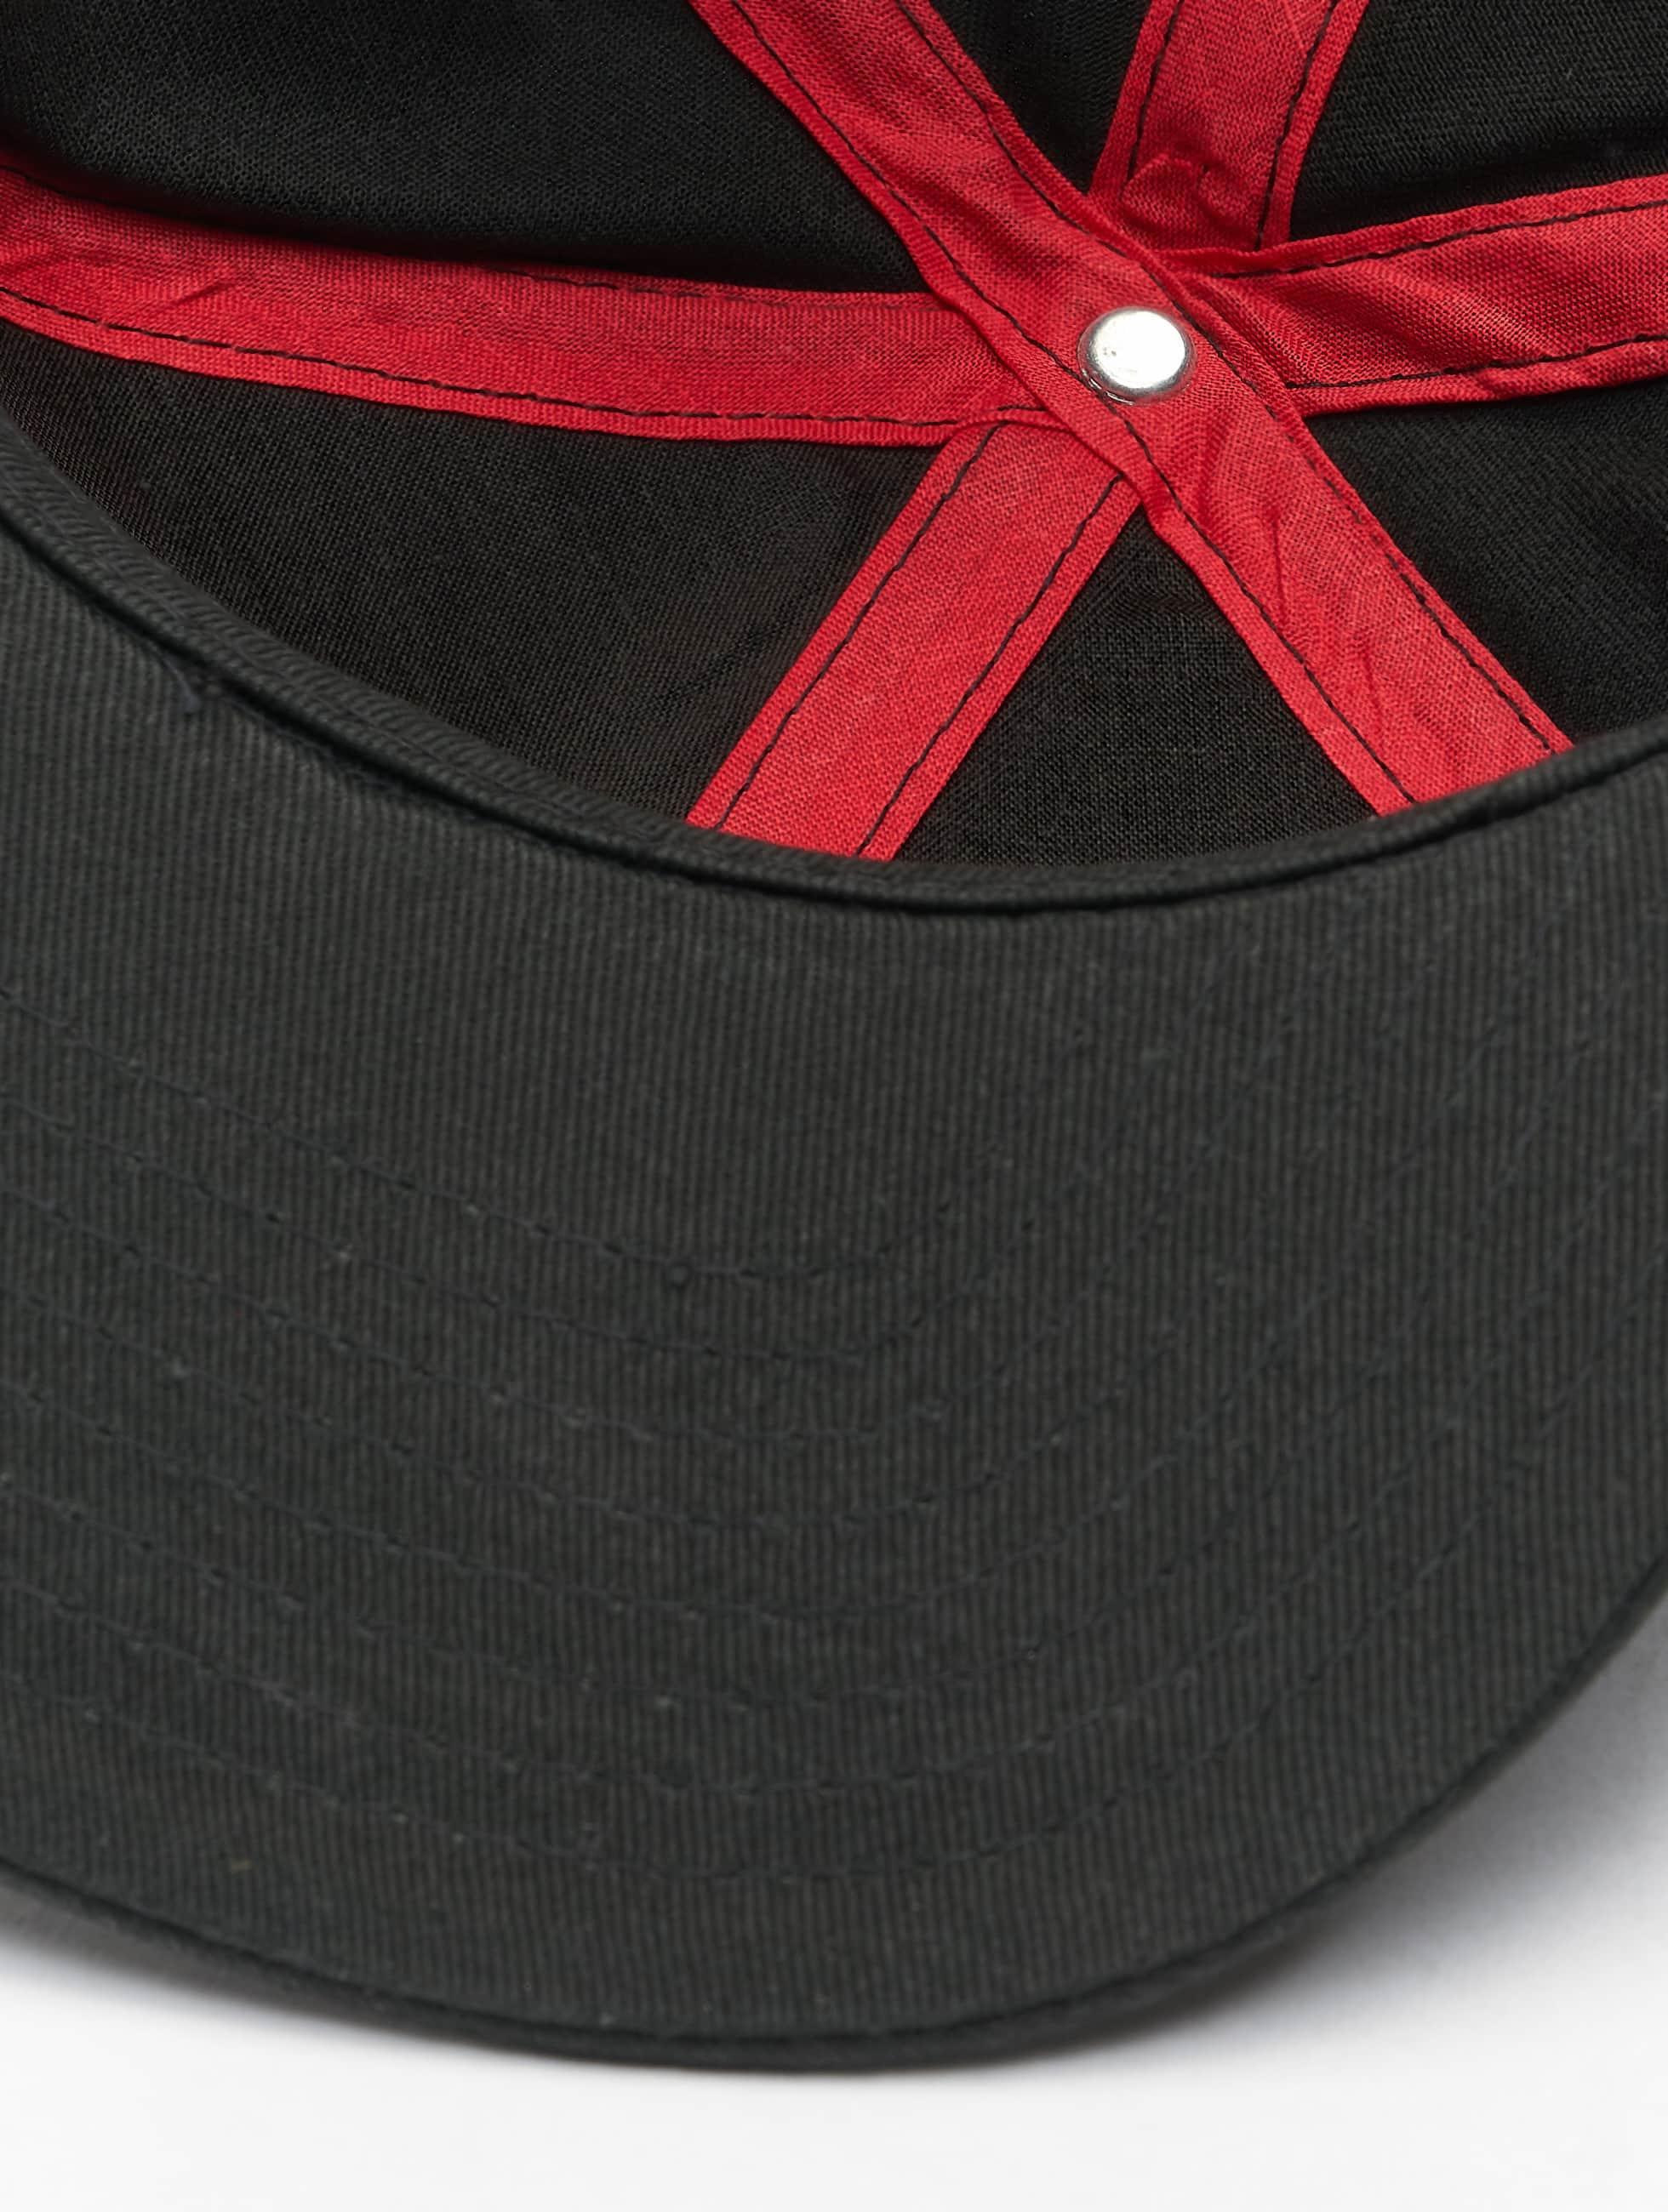 MSTRDS Casquette Snapback & Strapback W Letter noir